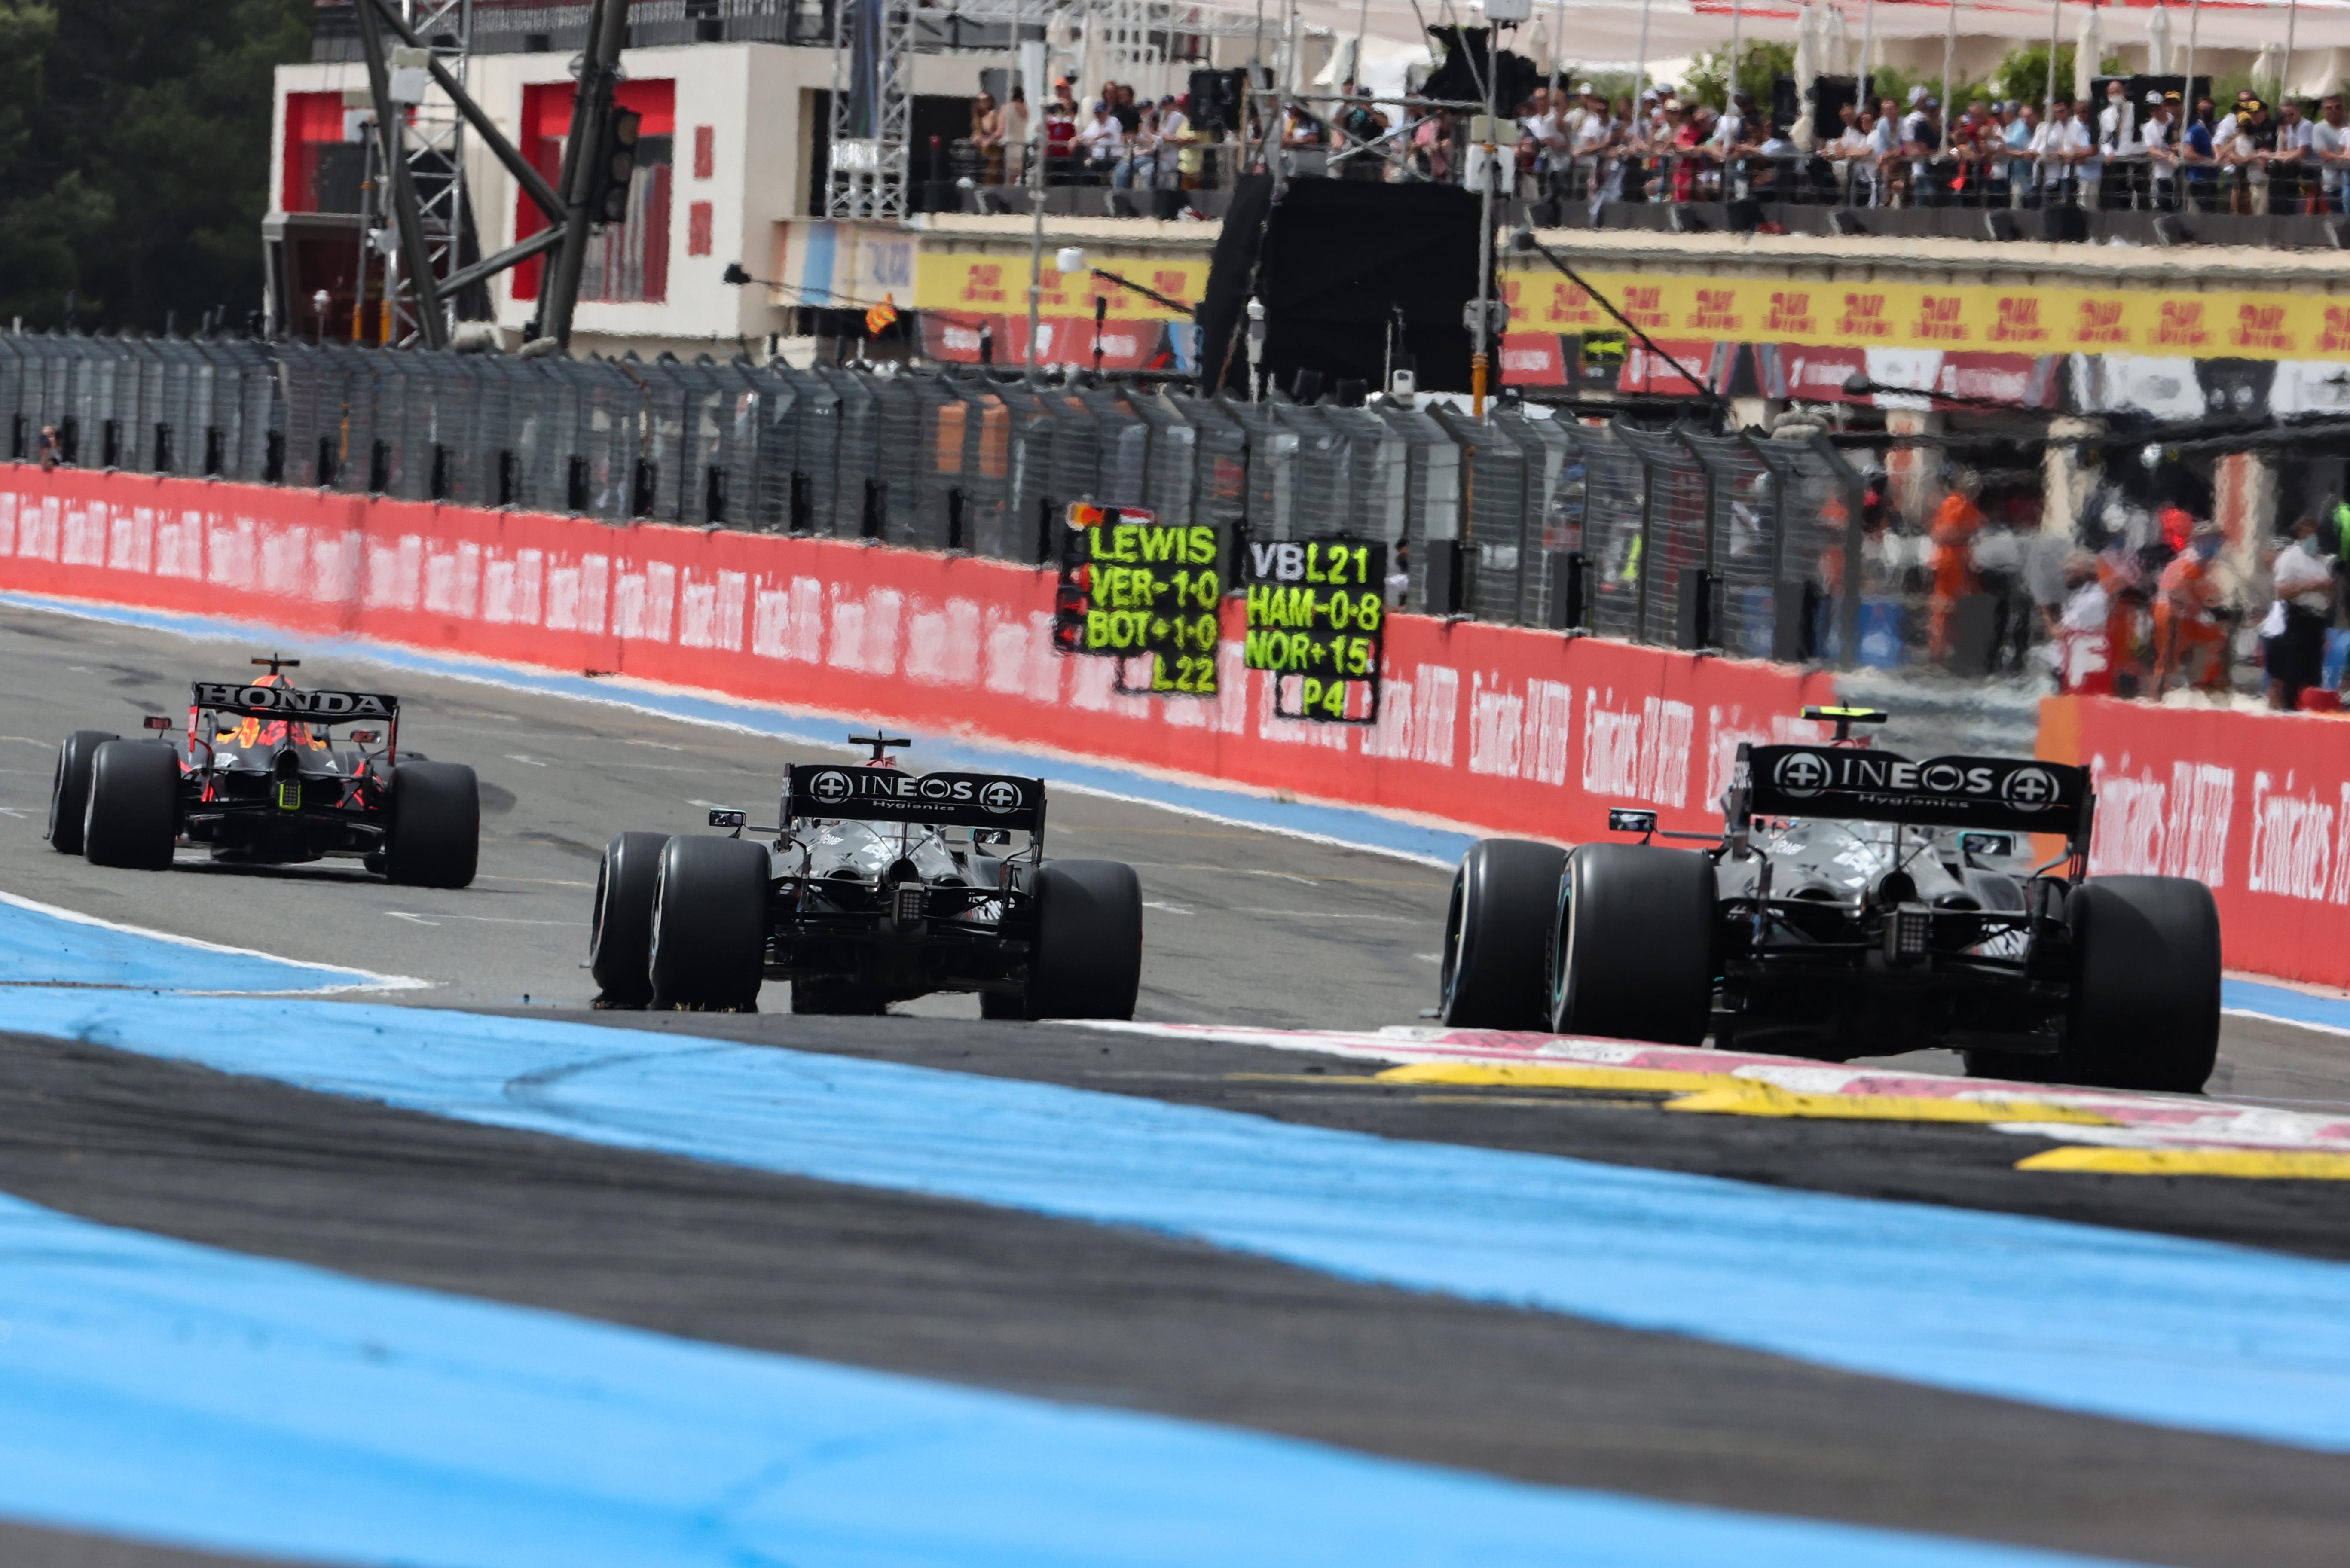 Motor Racing Formula One World Championship French Grand Prix Race Day Paul Ricard, France